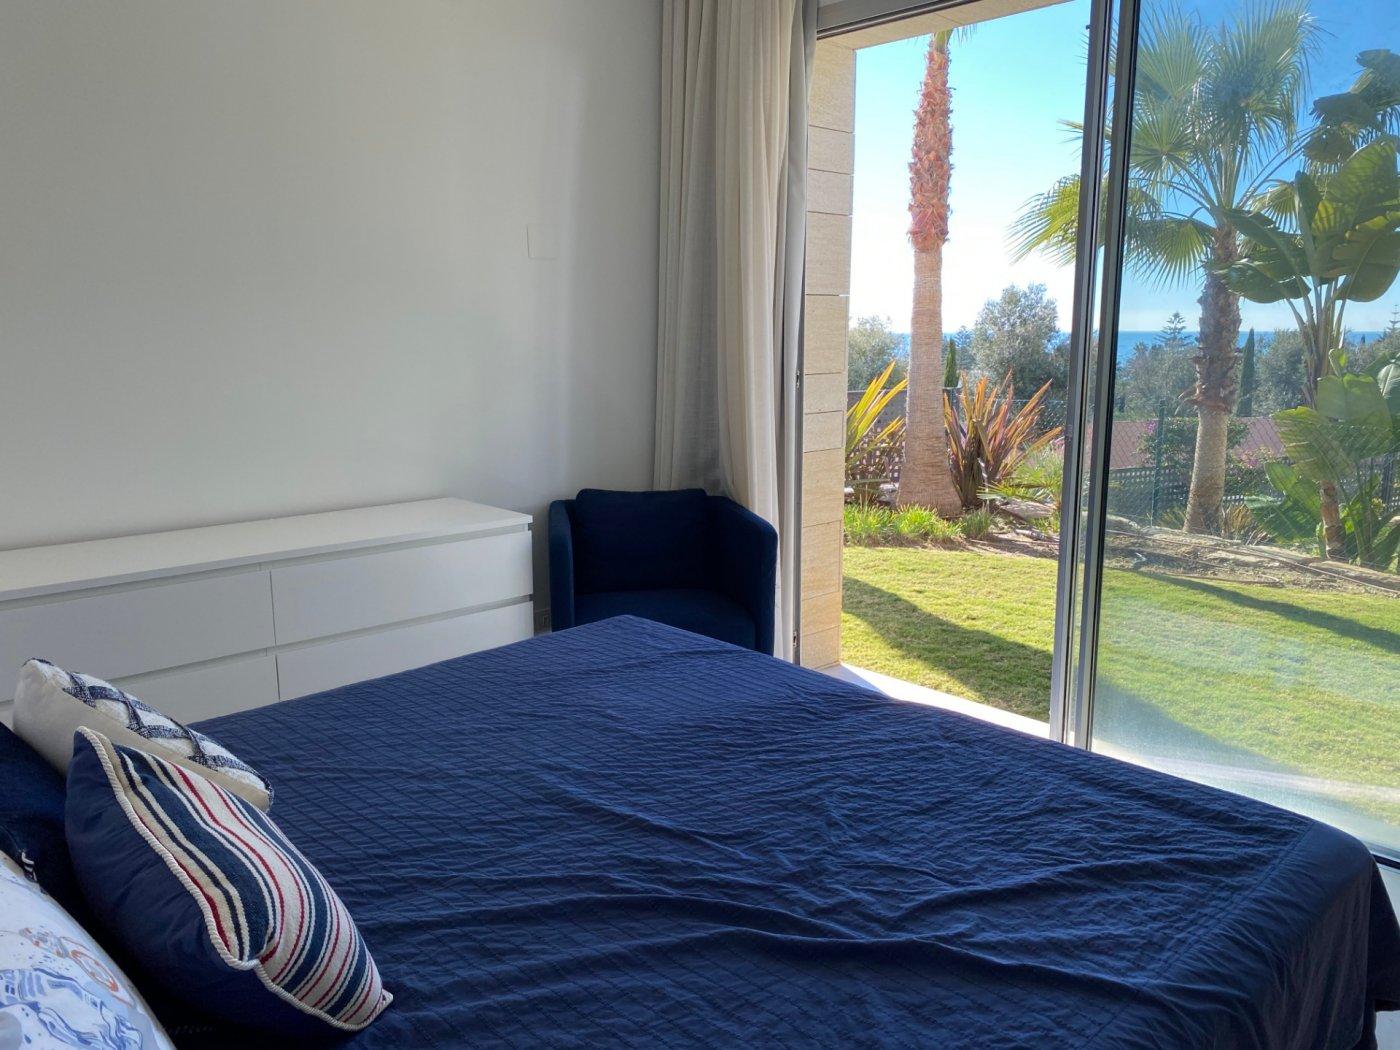 Villa with panoramic views over the sea in La Finca de Marbella